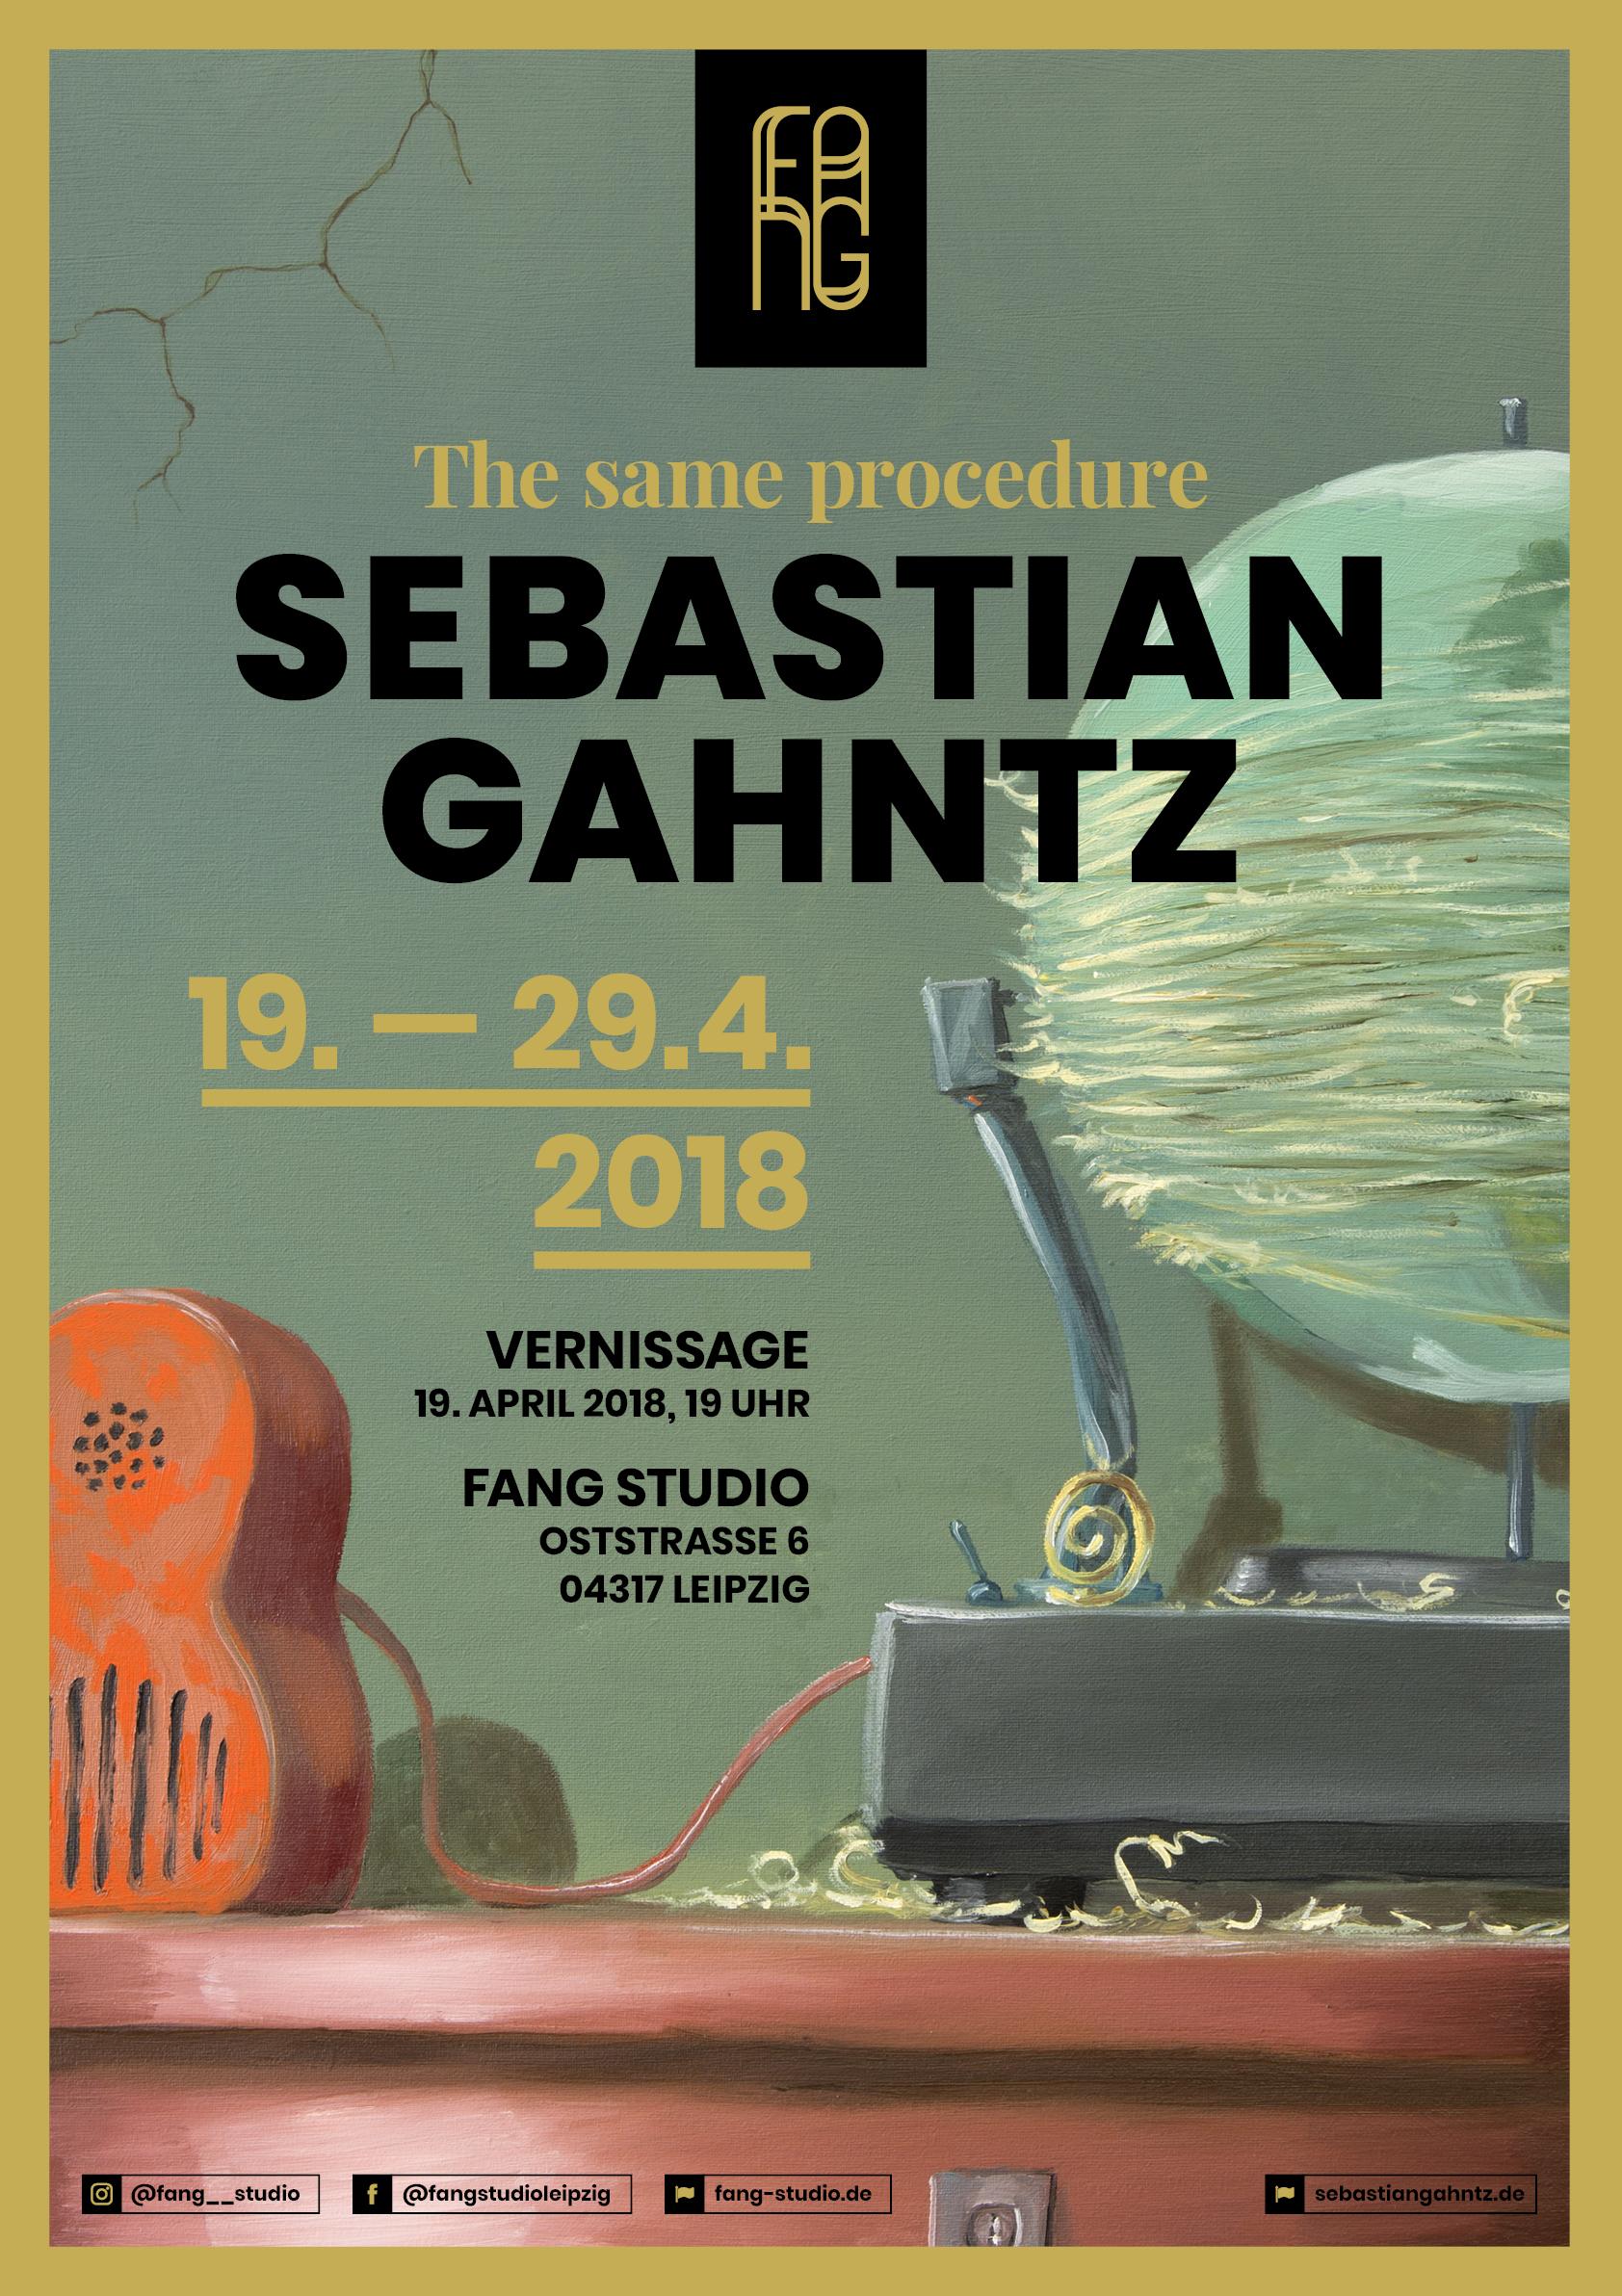 Sebastian Gahntz – The same procedure